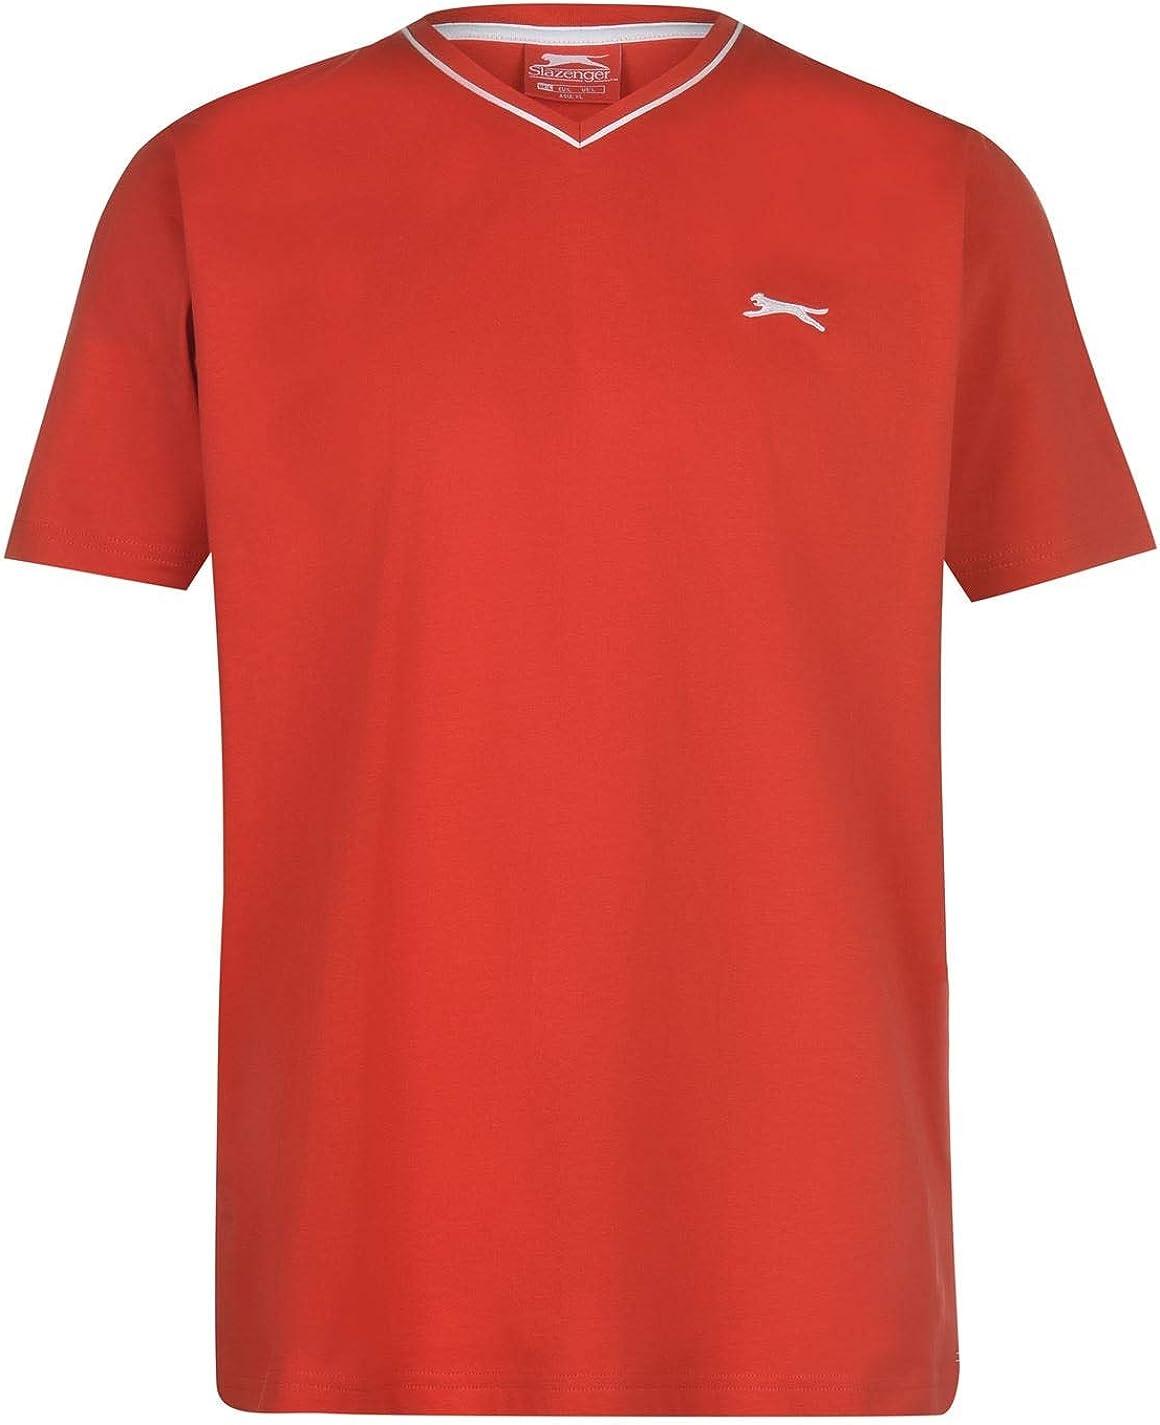 Slazenger Mens V Neck T-Shirt Tee Top Short Sleeve Lightweight Cotton Stripe